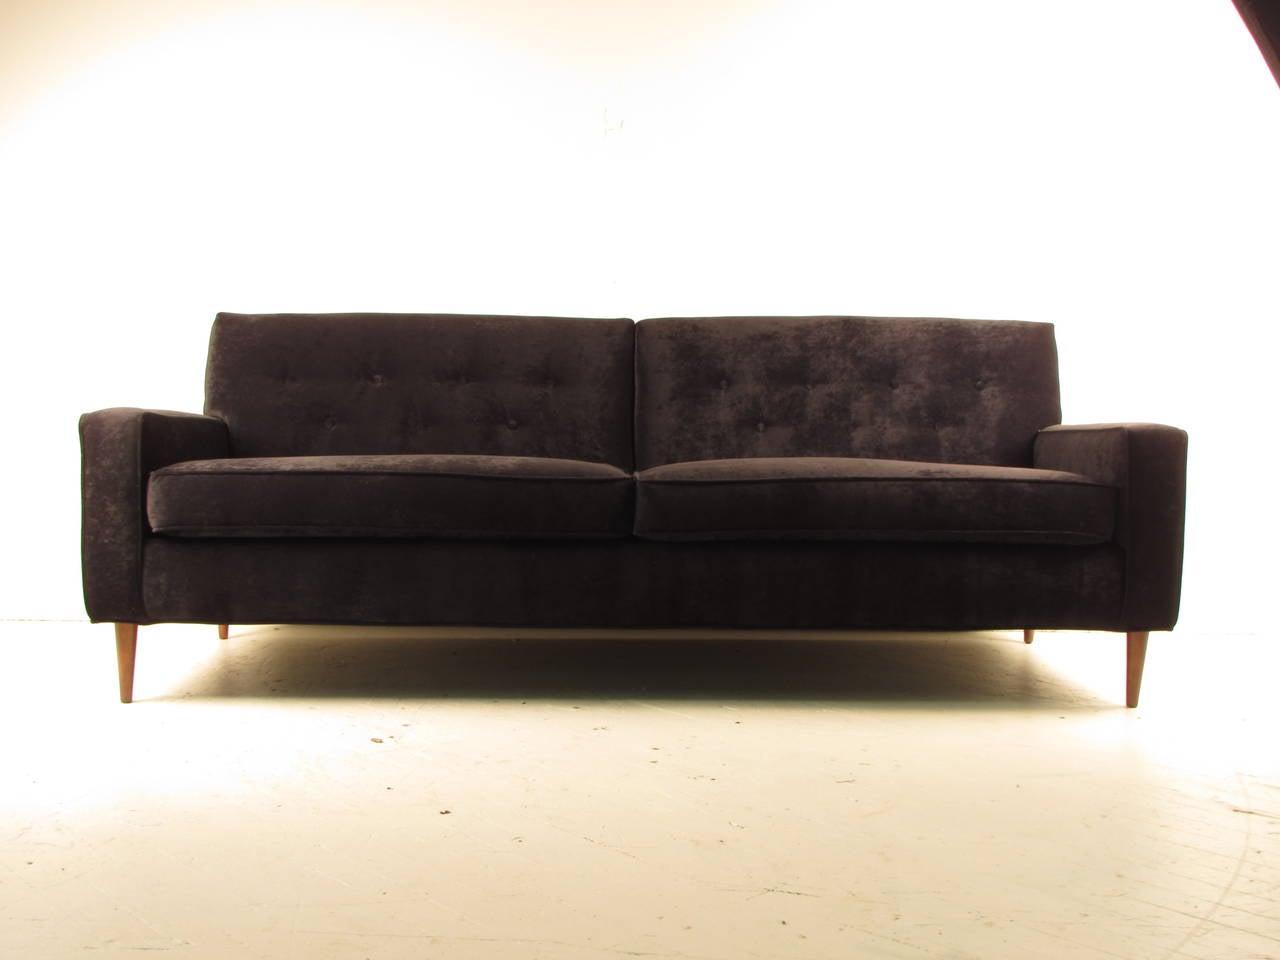 Seductive Black Velvet Sofa In The Style Of Milo Baughman